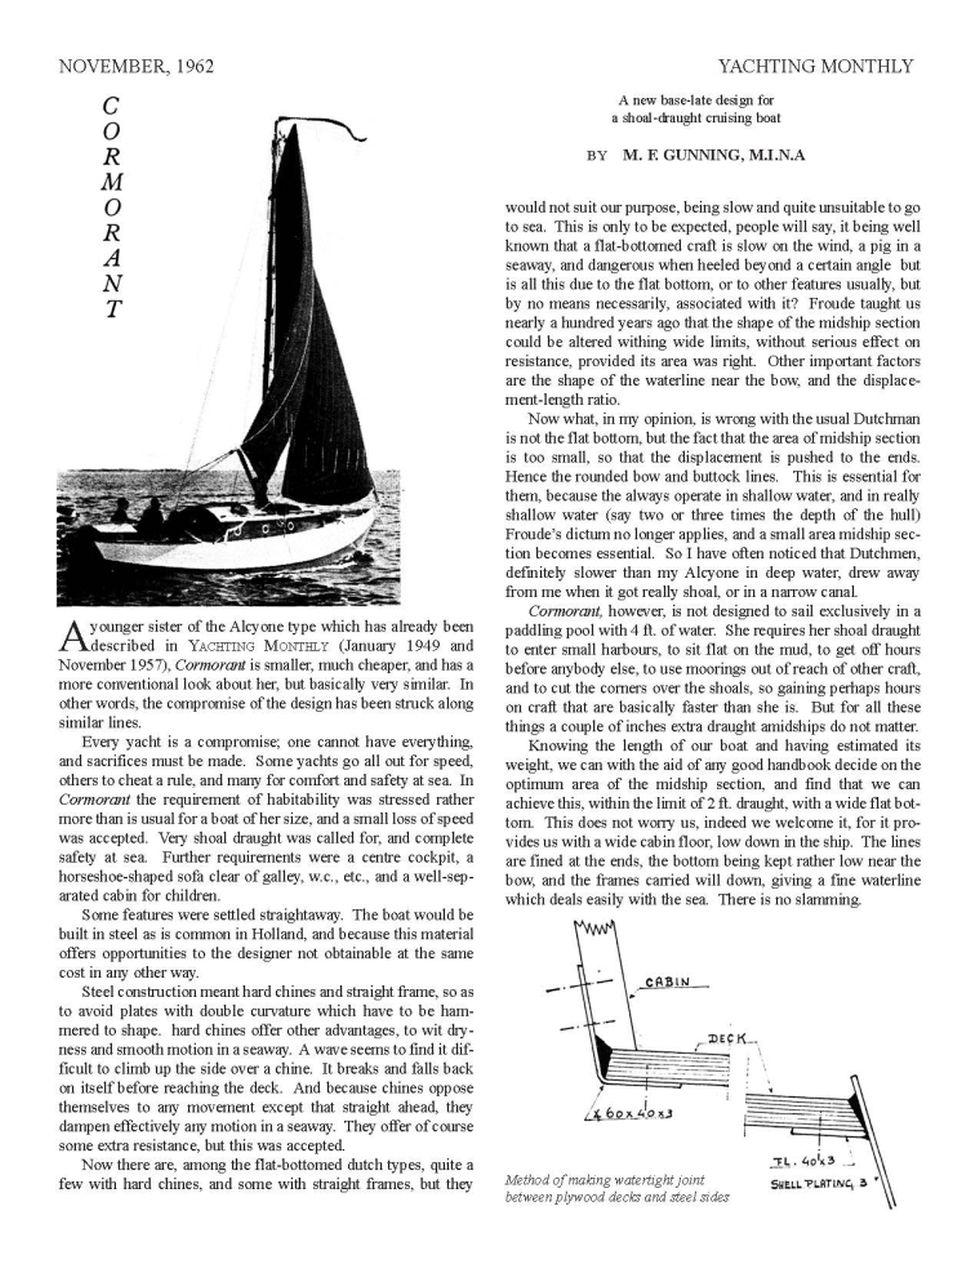 MG6_Page_1